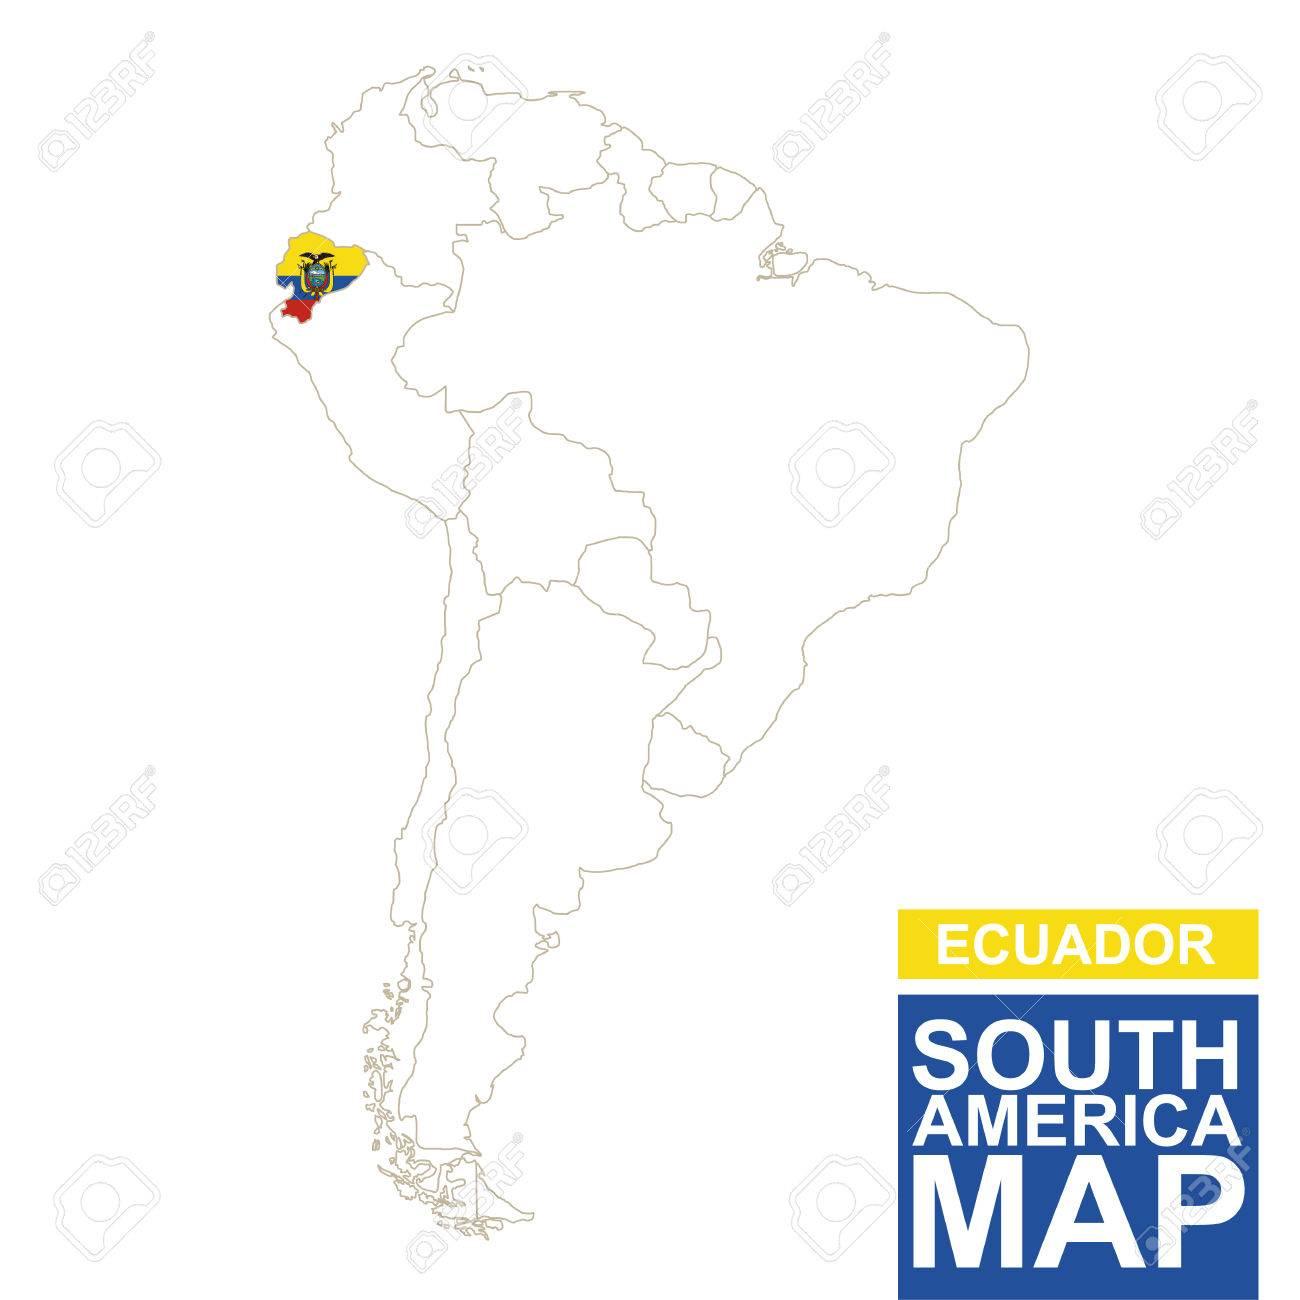 South America Map Ecuador.South America Contoured Map With Highlighted Ecuador Ecuador